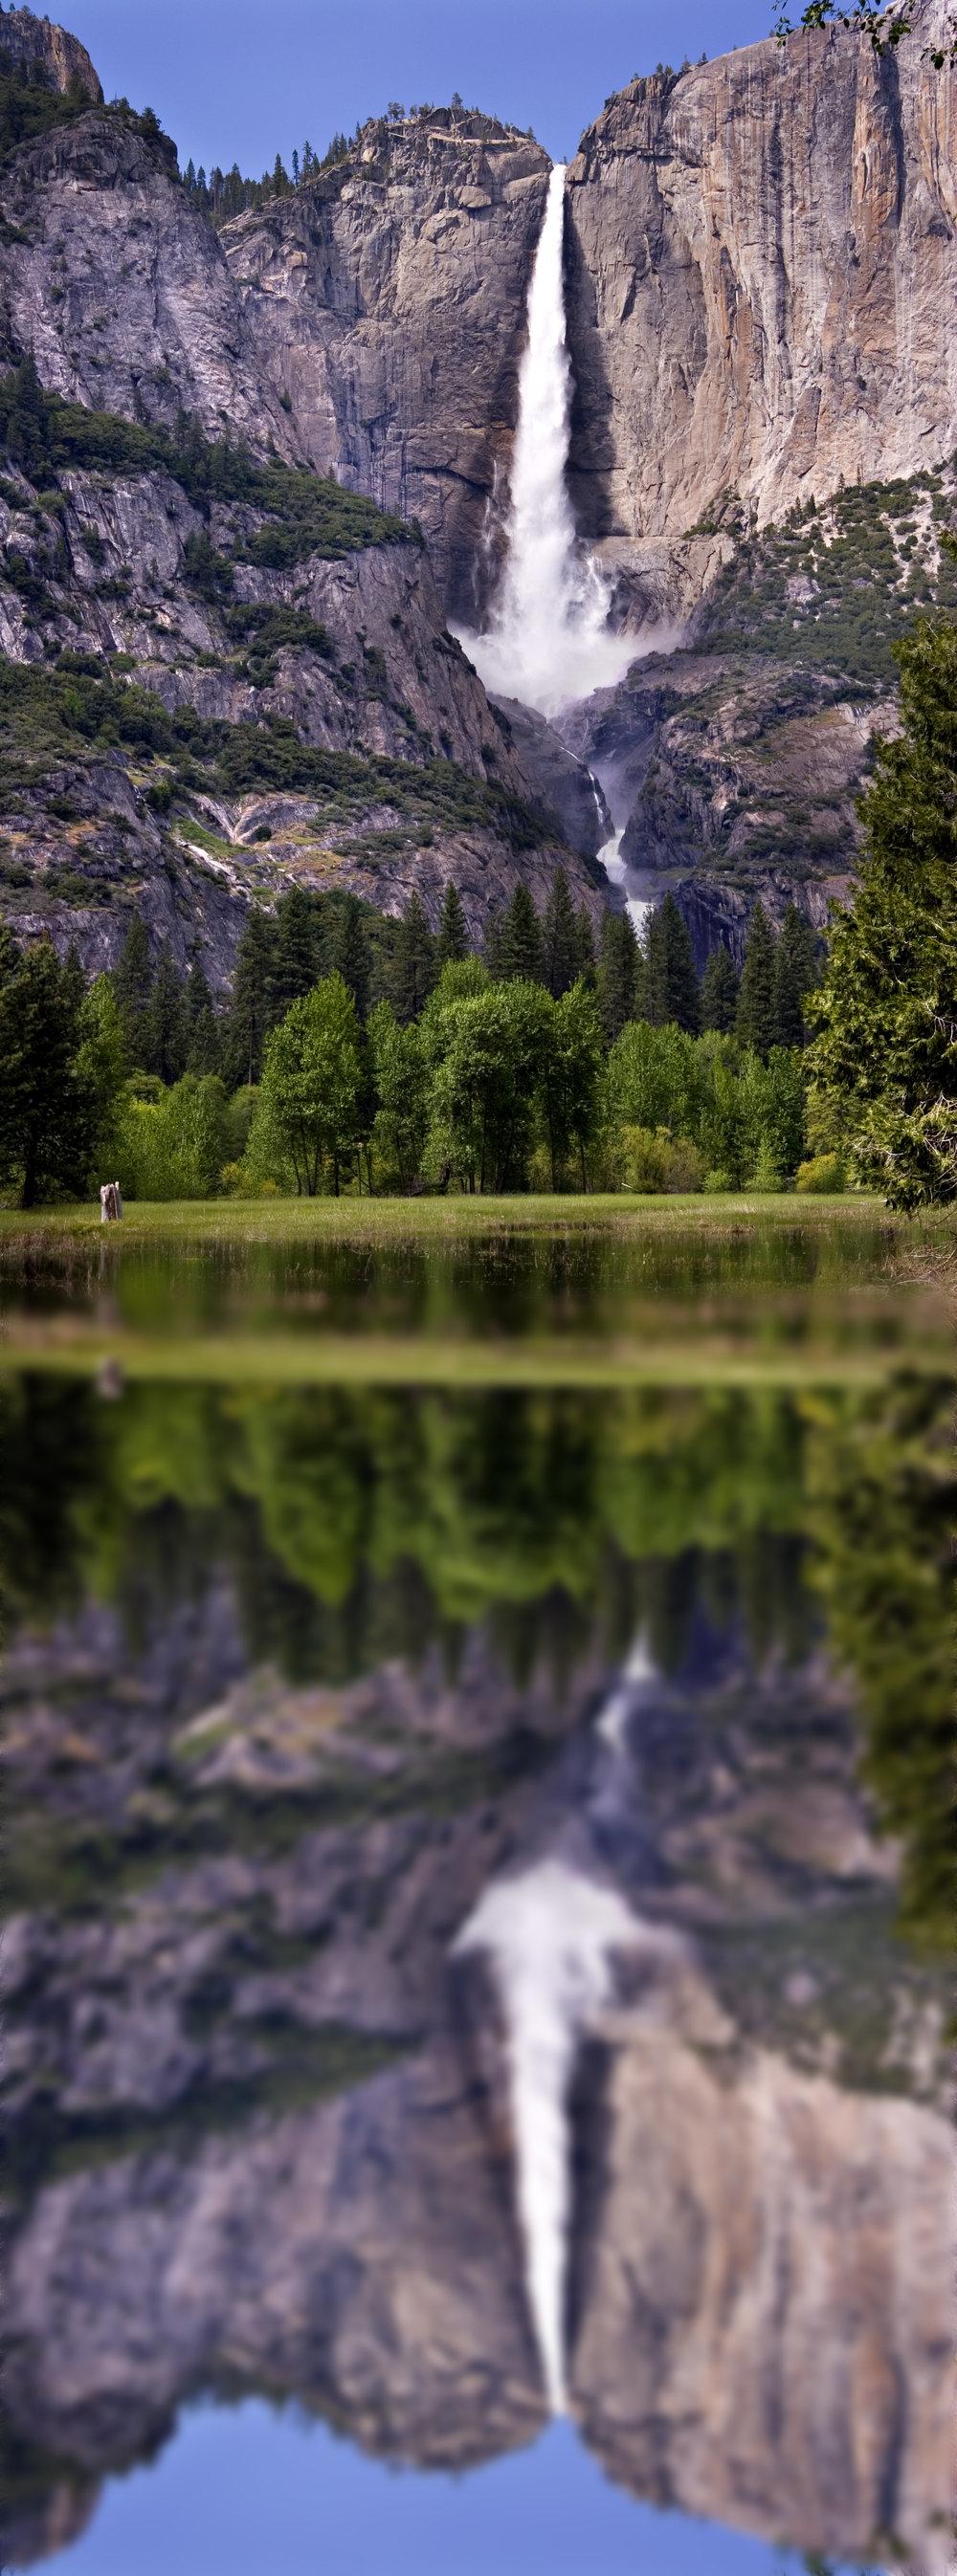 Yosemitefallsmirror.jpg